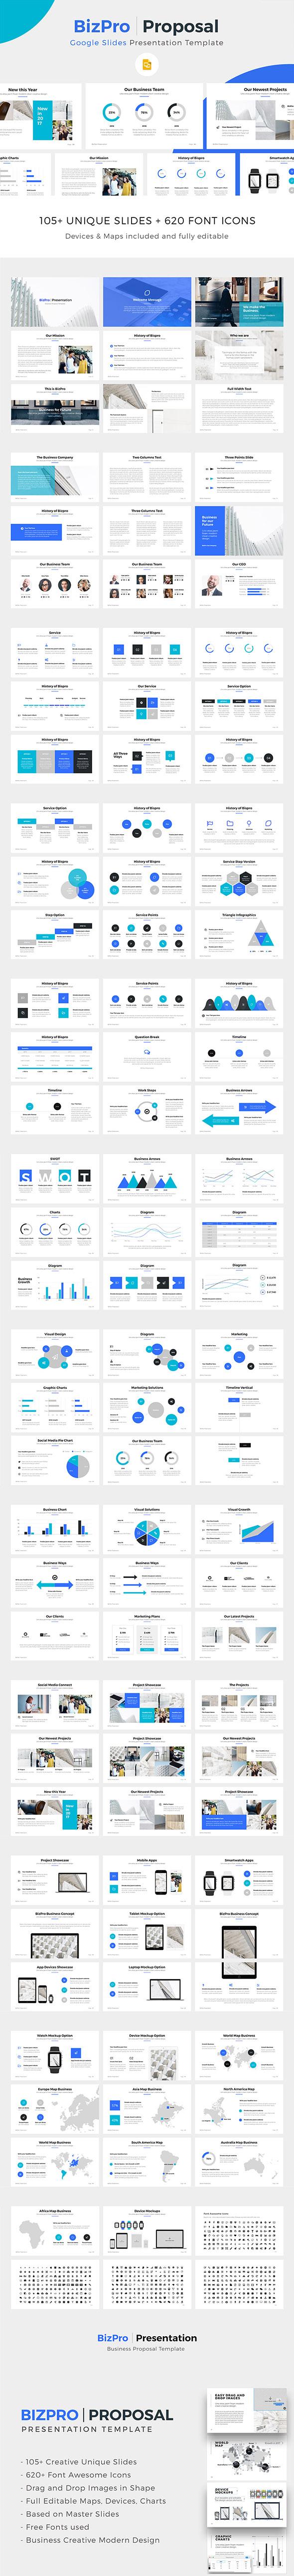 BizPro | Google Slides Proposal Business Template - Google Slides Presentation Templates